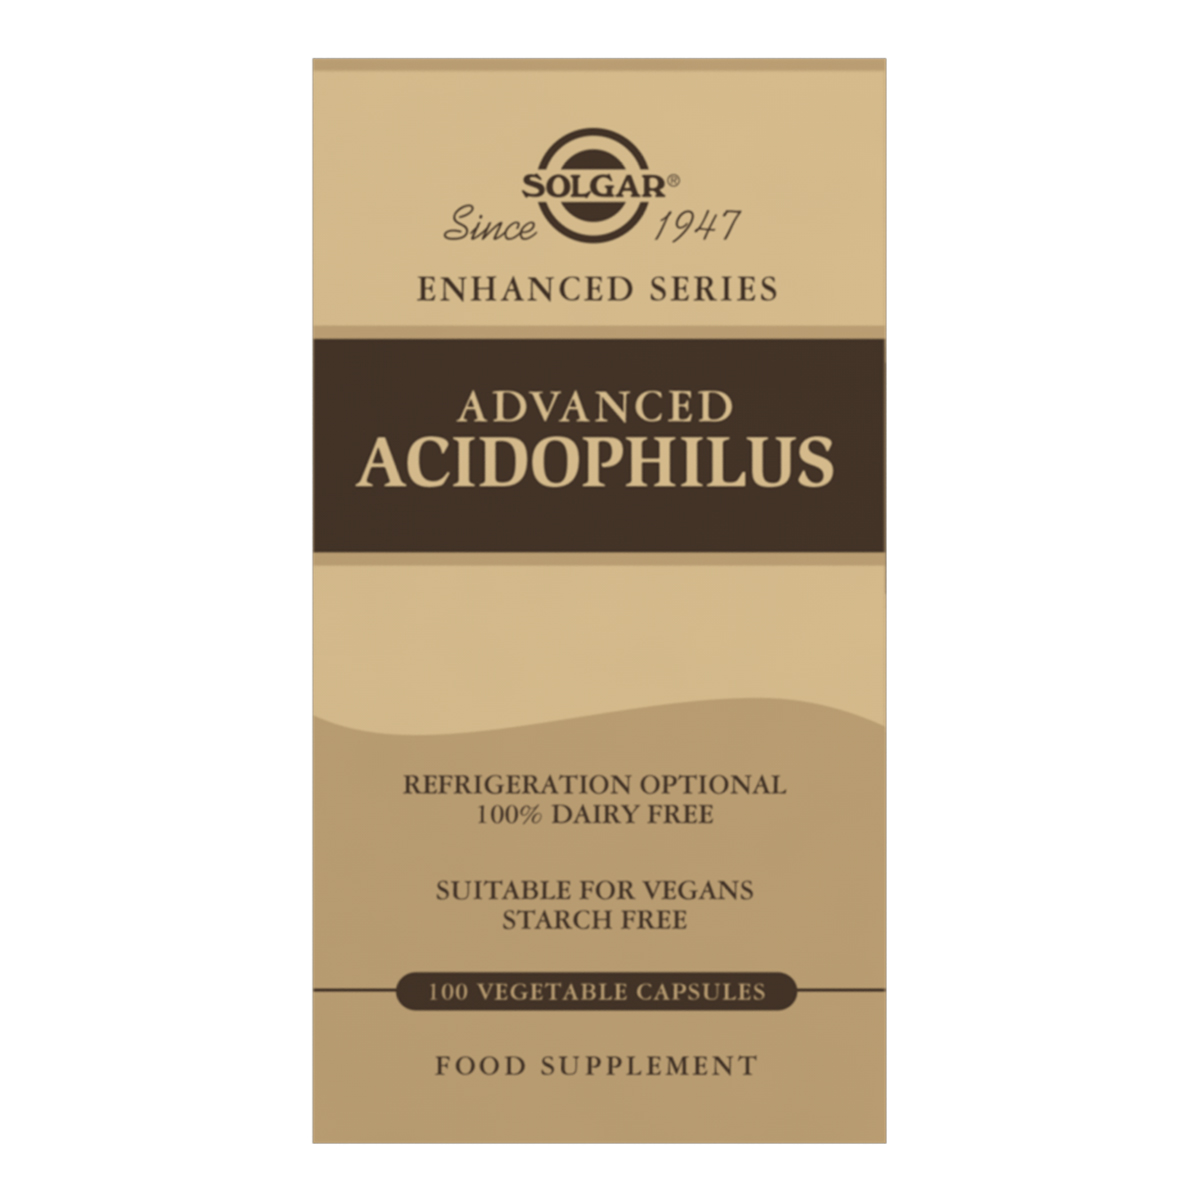 Advanced Acidophilus 100% Dairy Free 100's